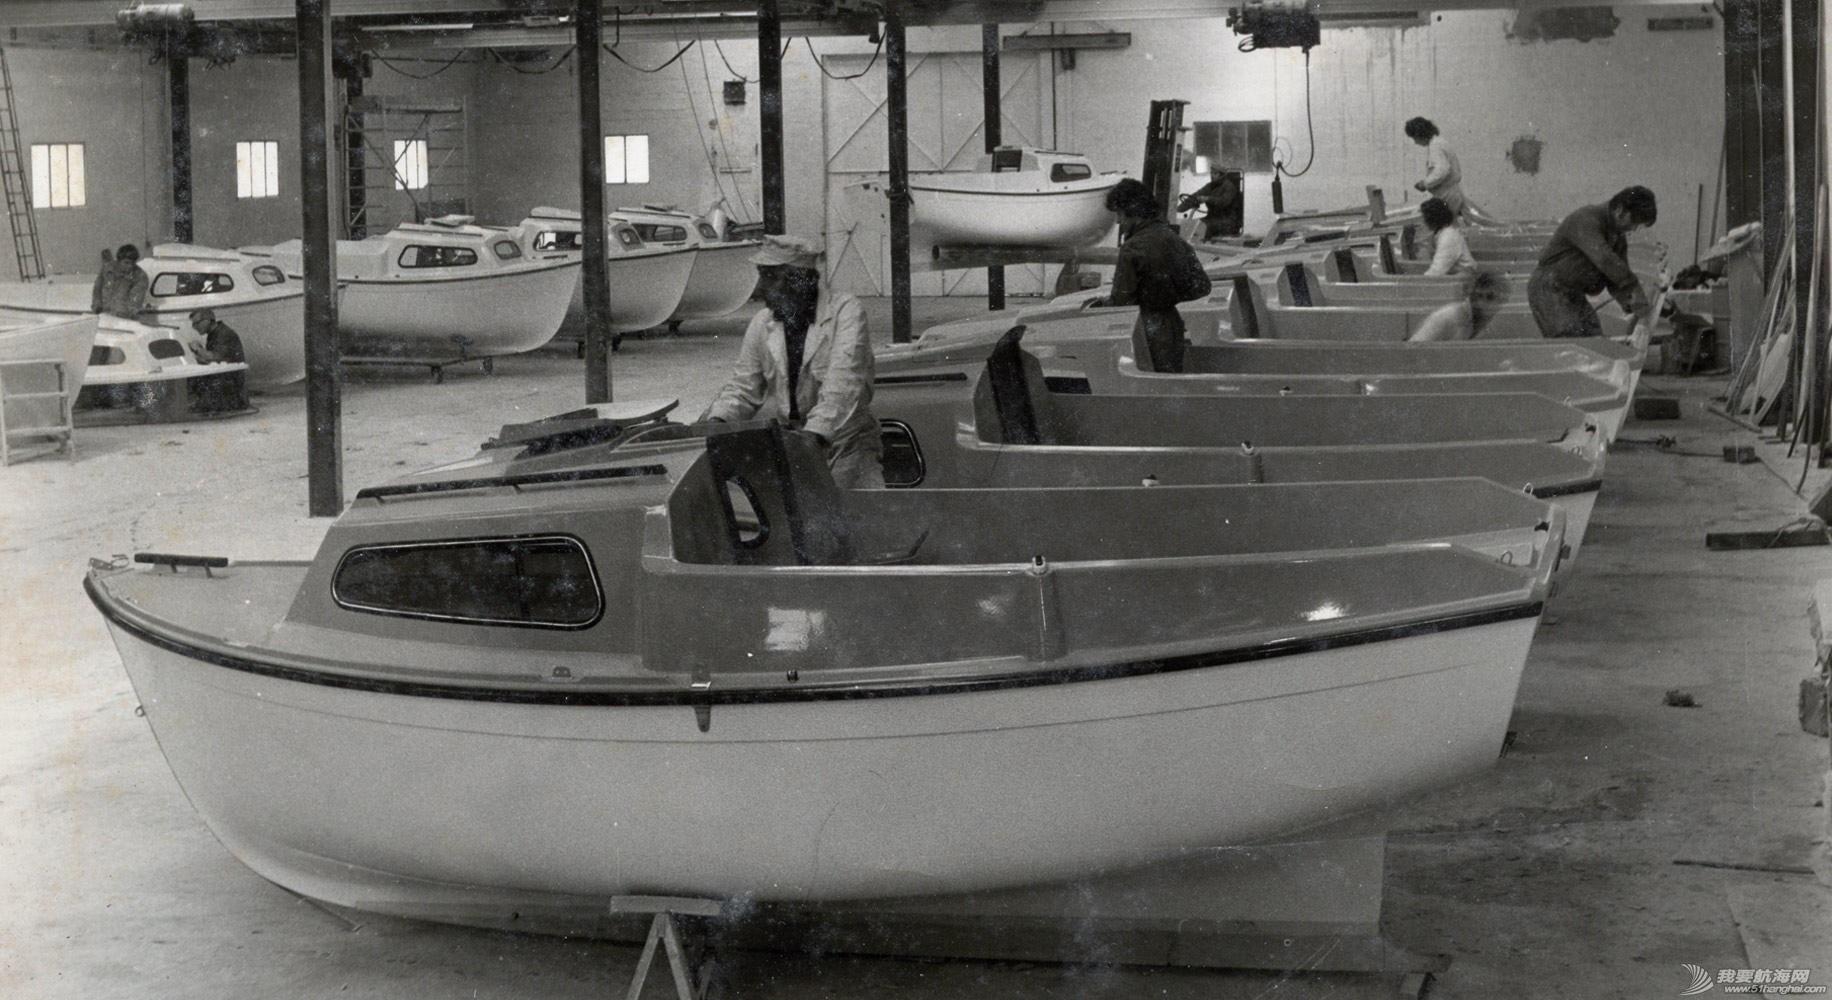 1972peches-promenade-usine2.jpg?itok=-9H7BkzV